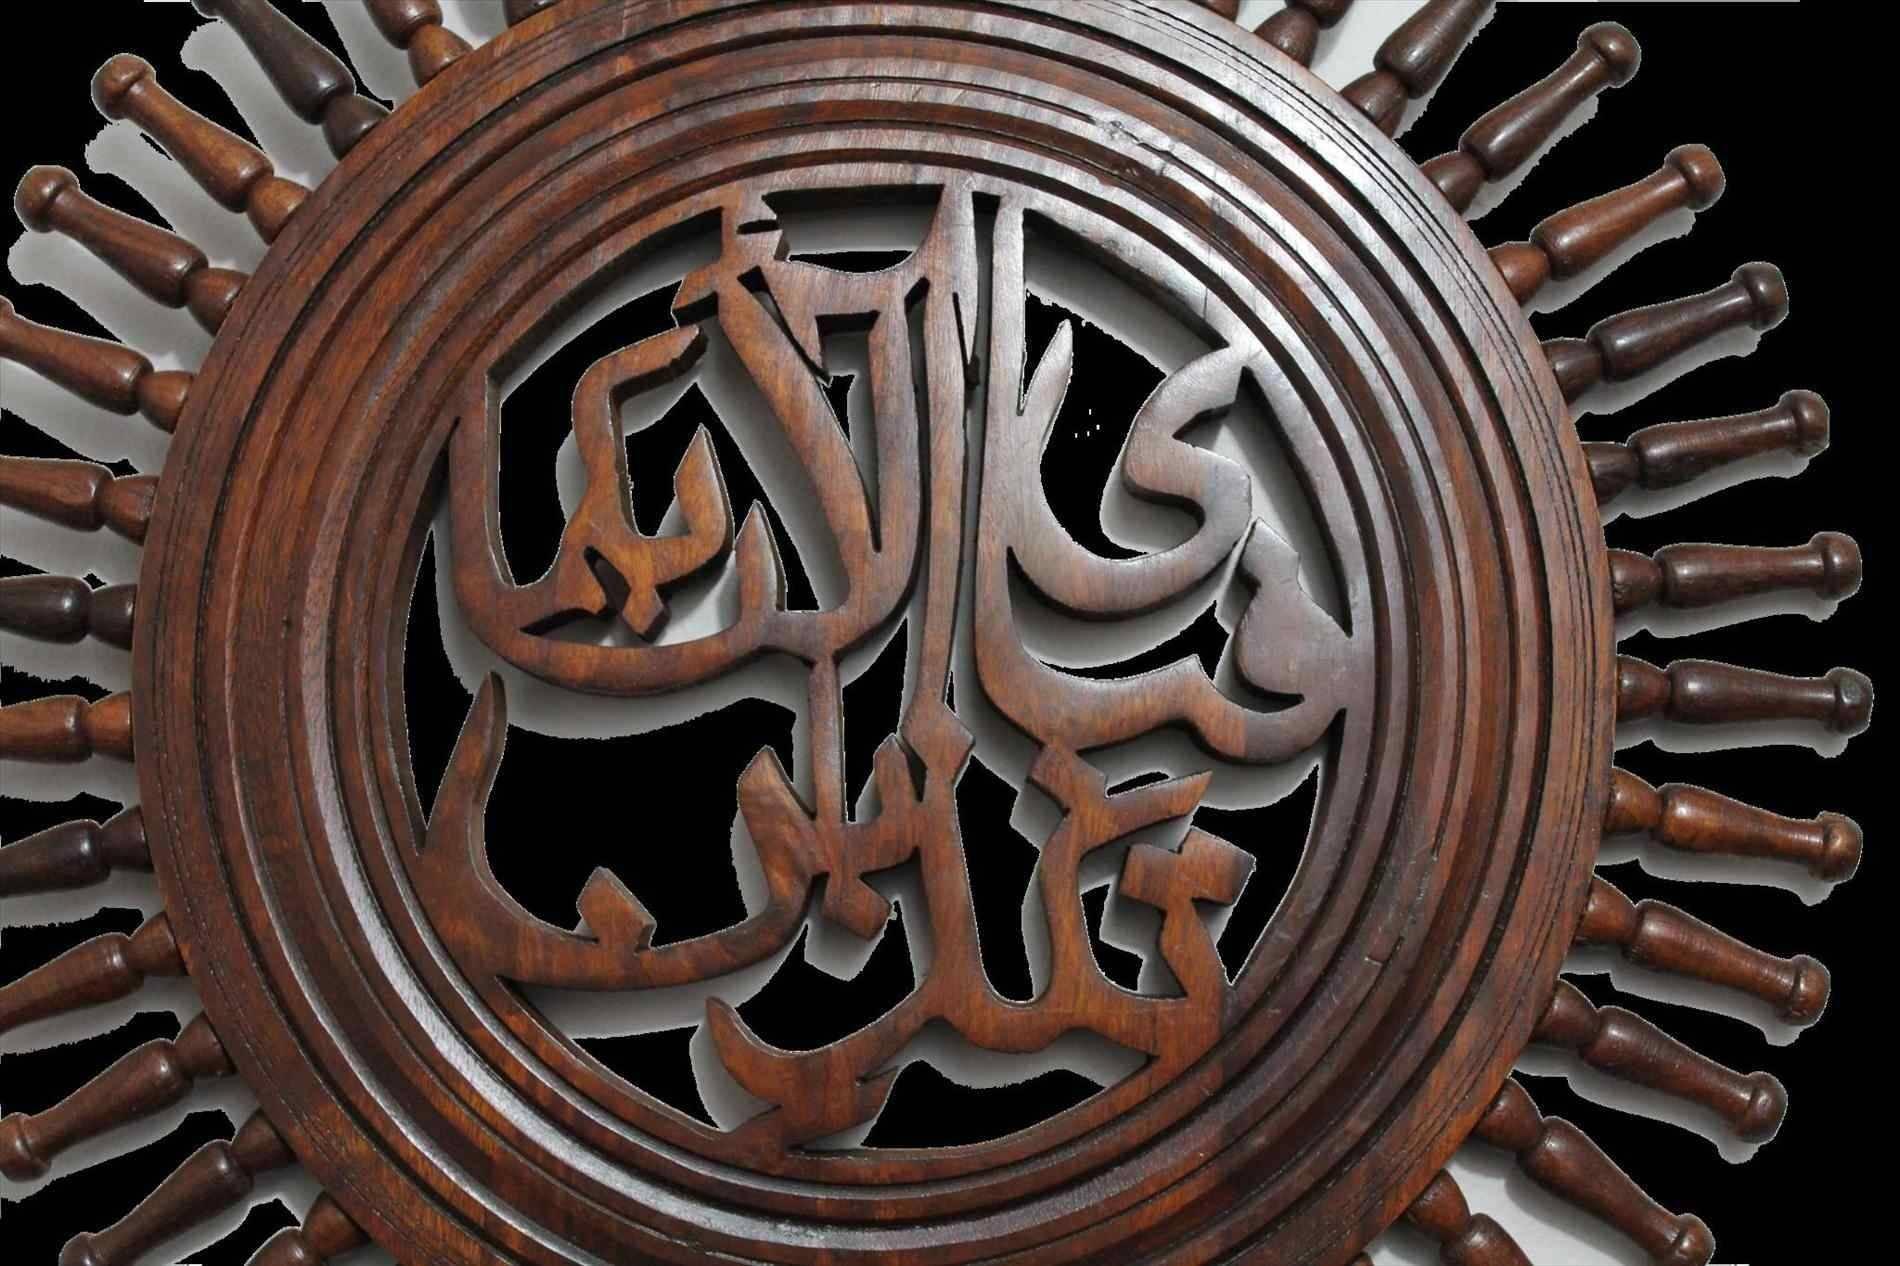 Islamic Metal Wall Art | Home Interior Decor Pertaining To Most Current Islamic Metal Wall Art (Gallery 19 of 20)